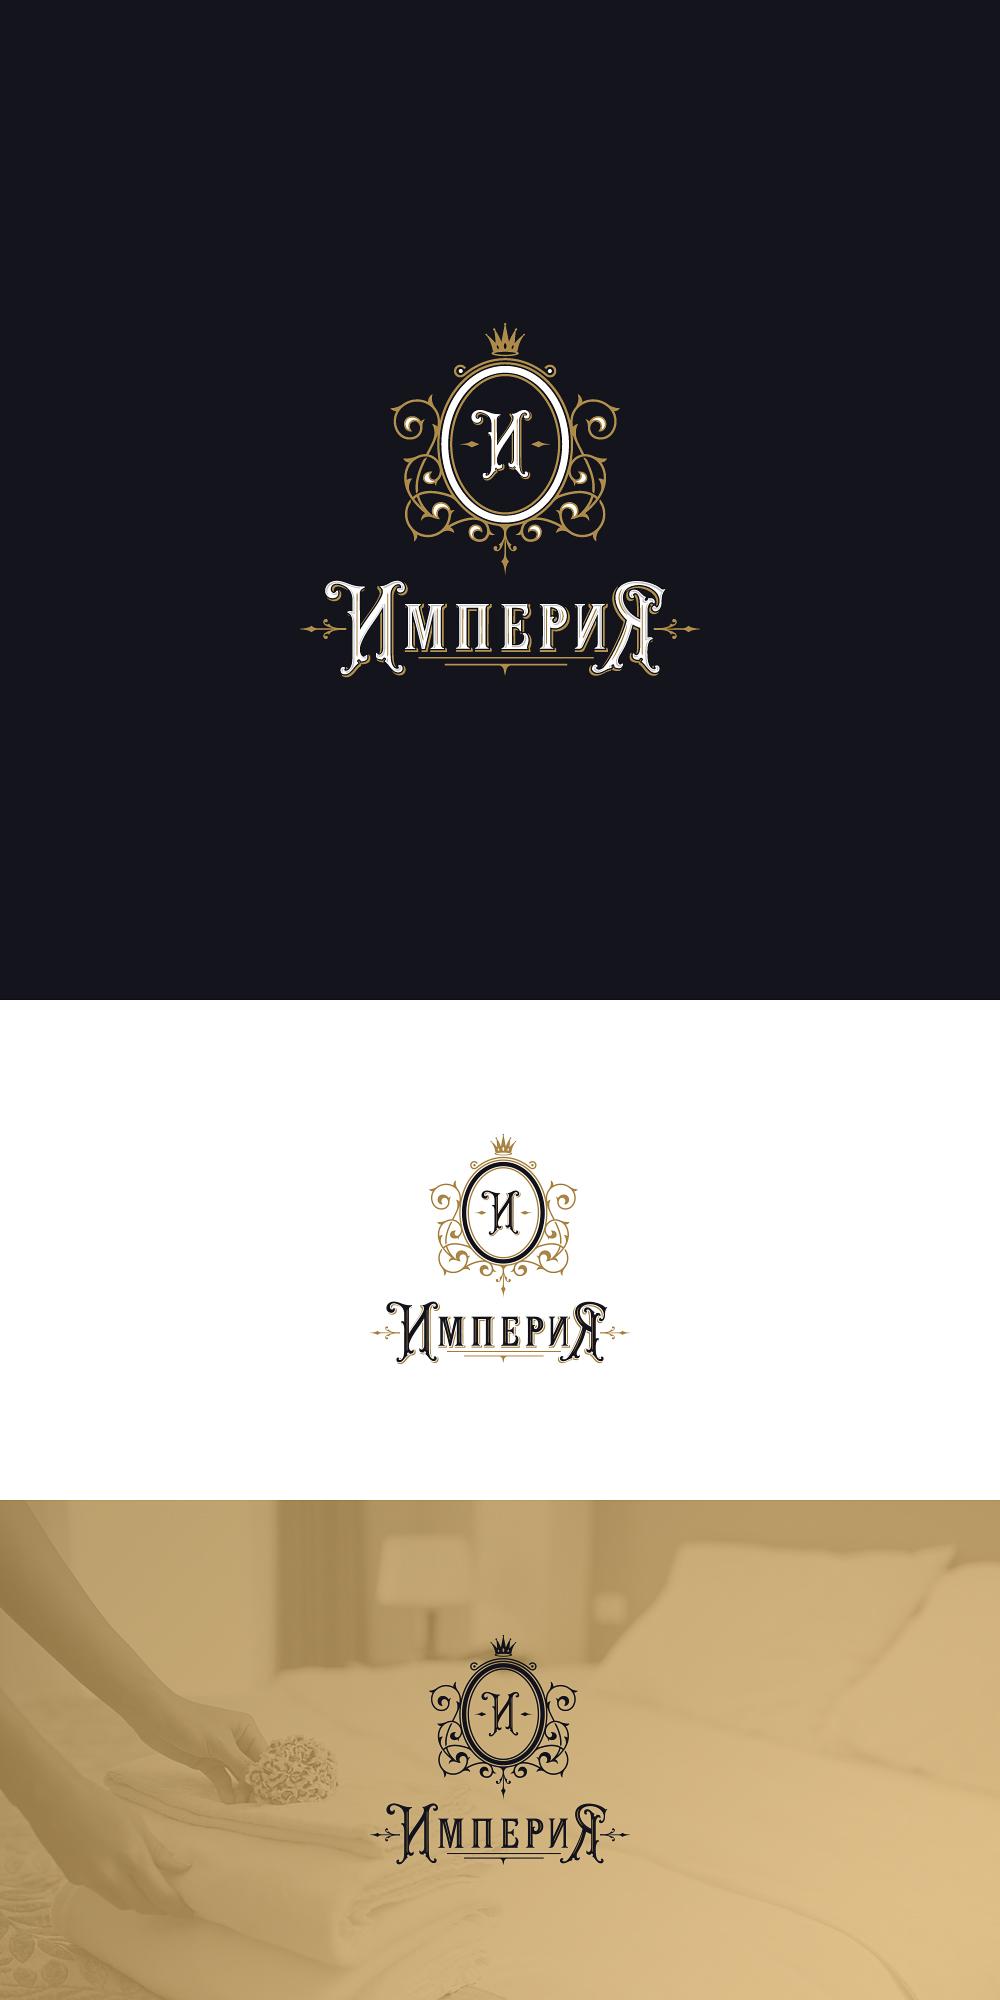 Разработать логотип для нового бренда фото f_39259e4aa2db4fa7.jpg